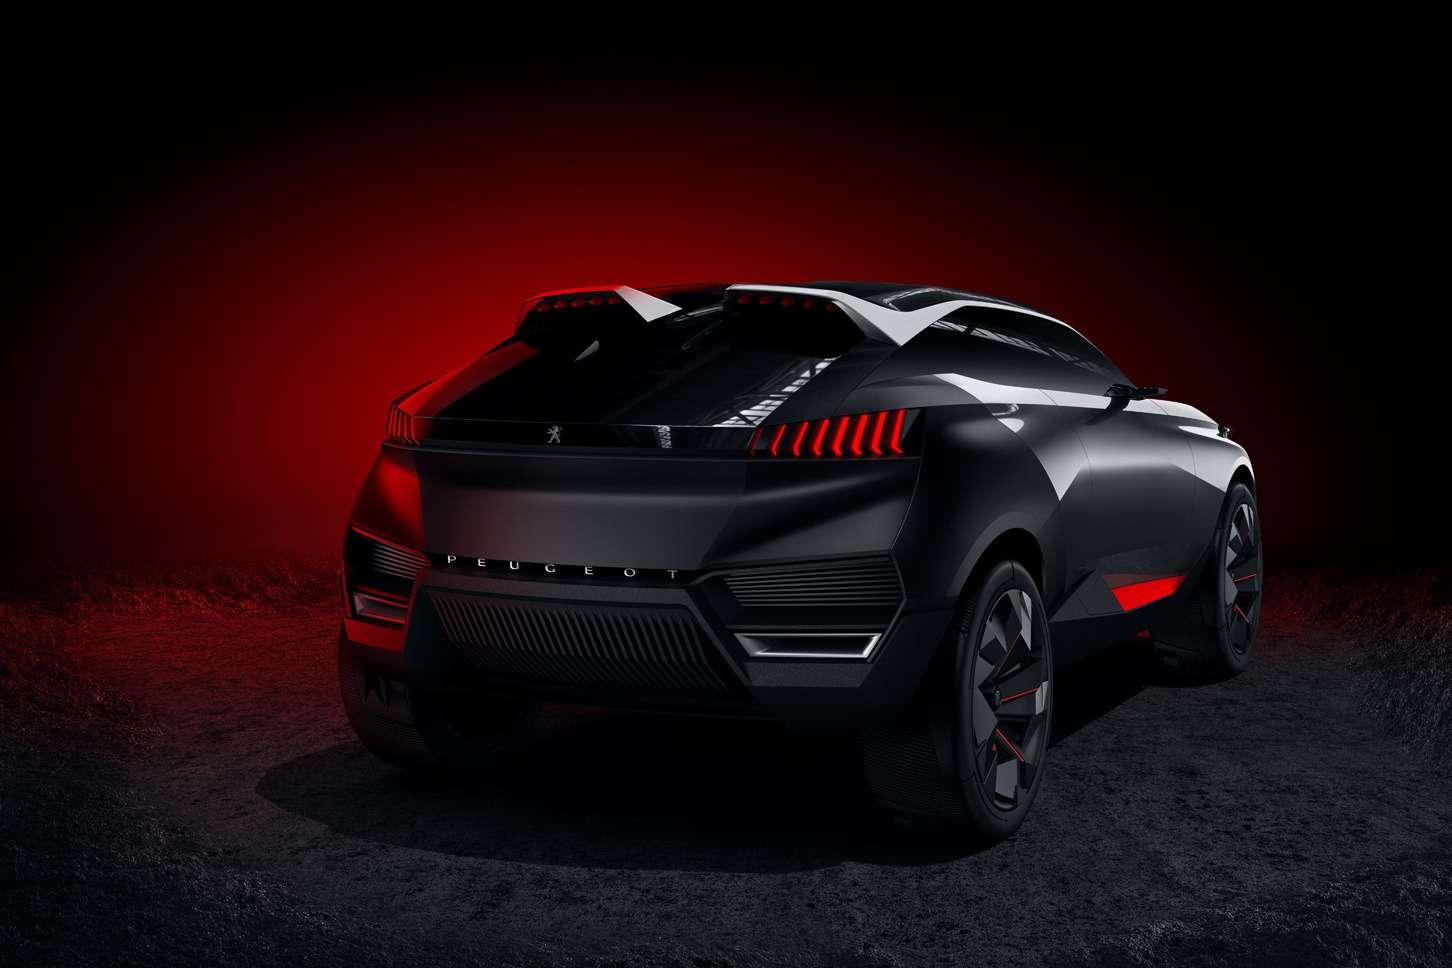 Peugeot-Quartz-Concept-6